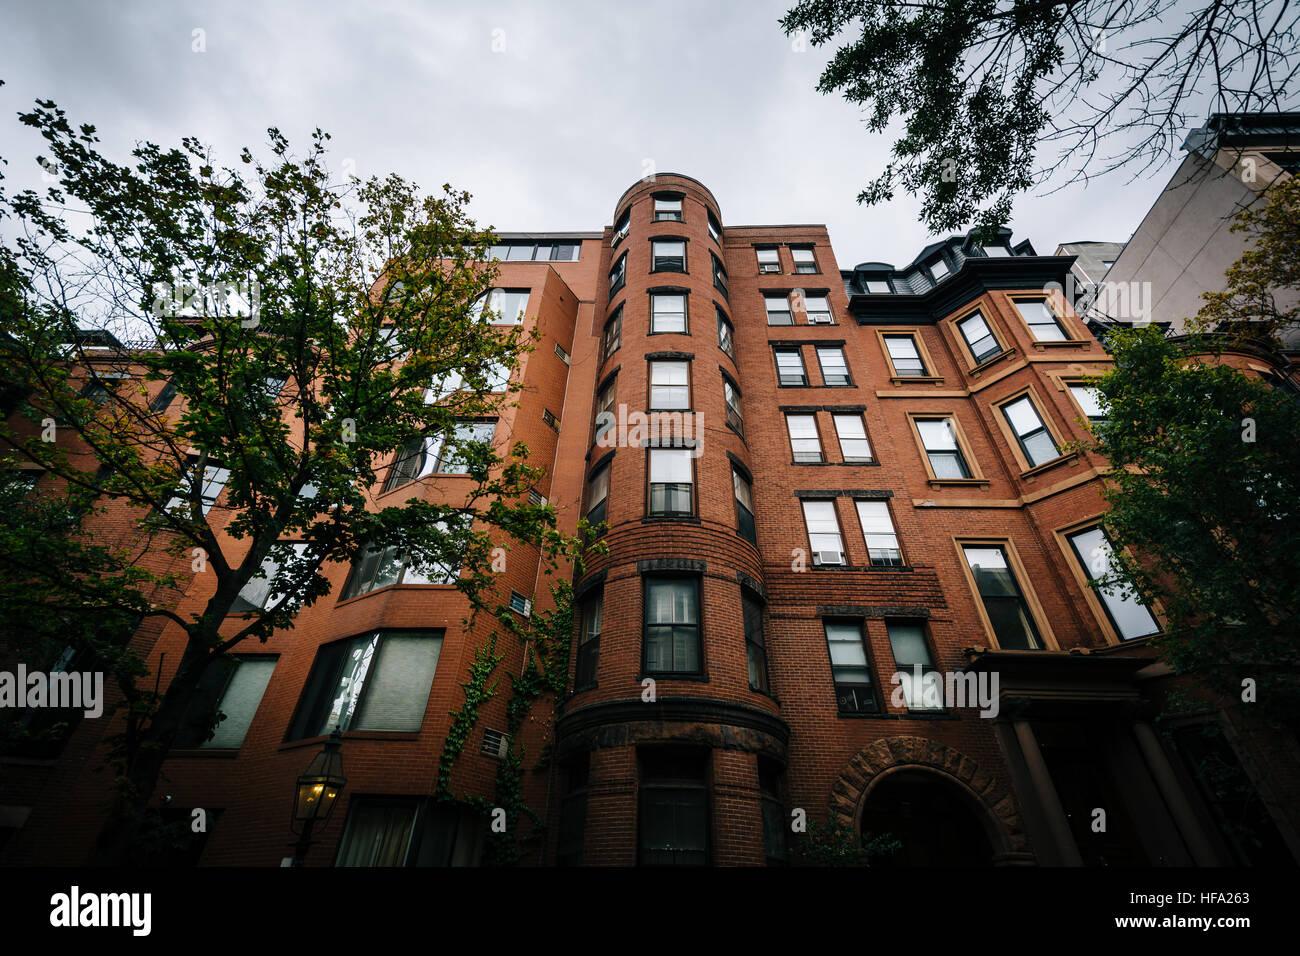 Historic brick buildings in Beacon Hill, Boston, Massachusetts. Stock Photo